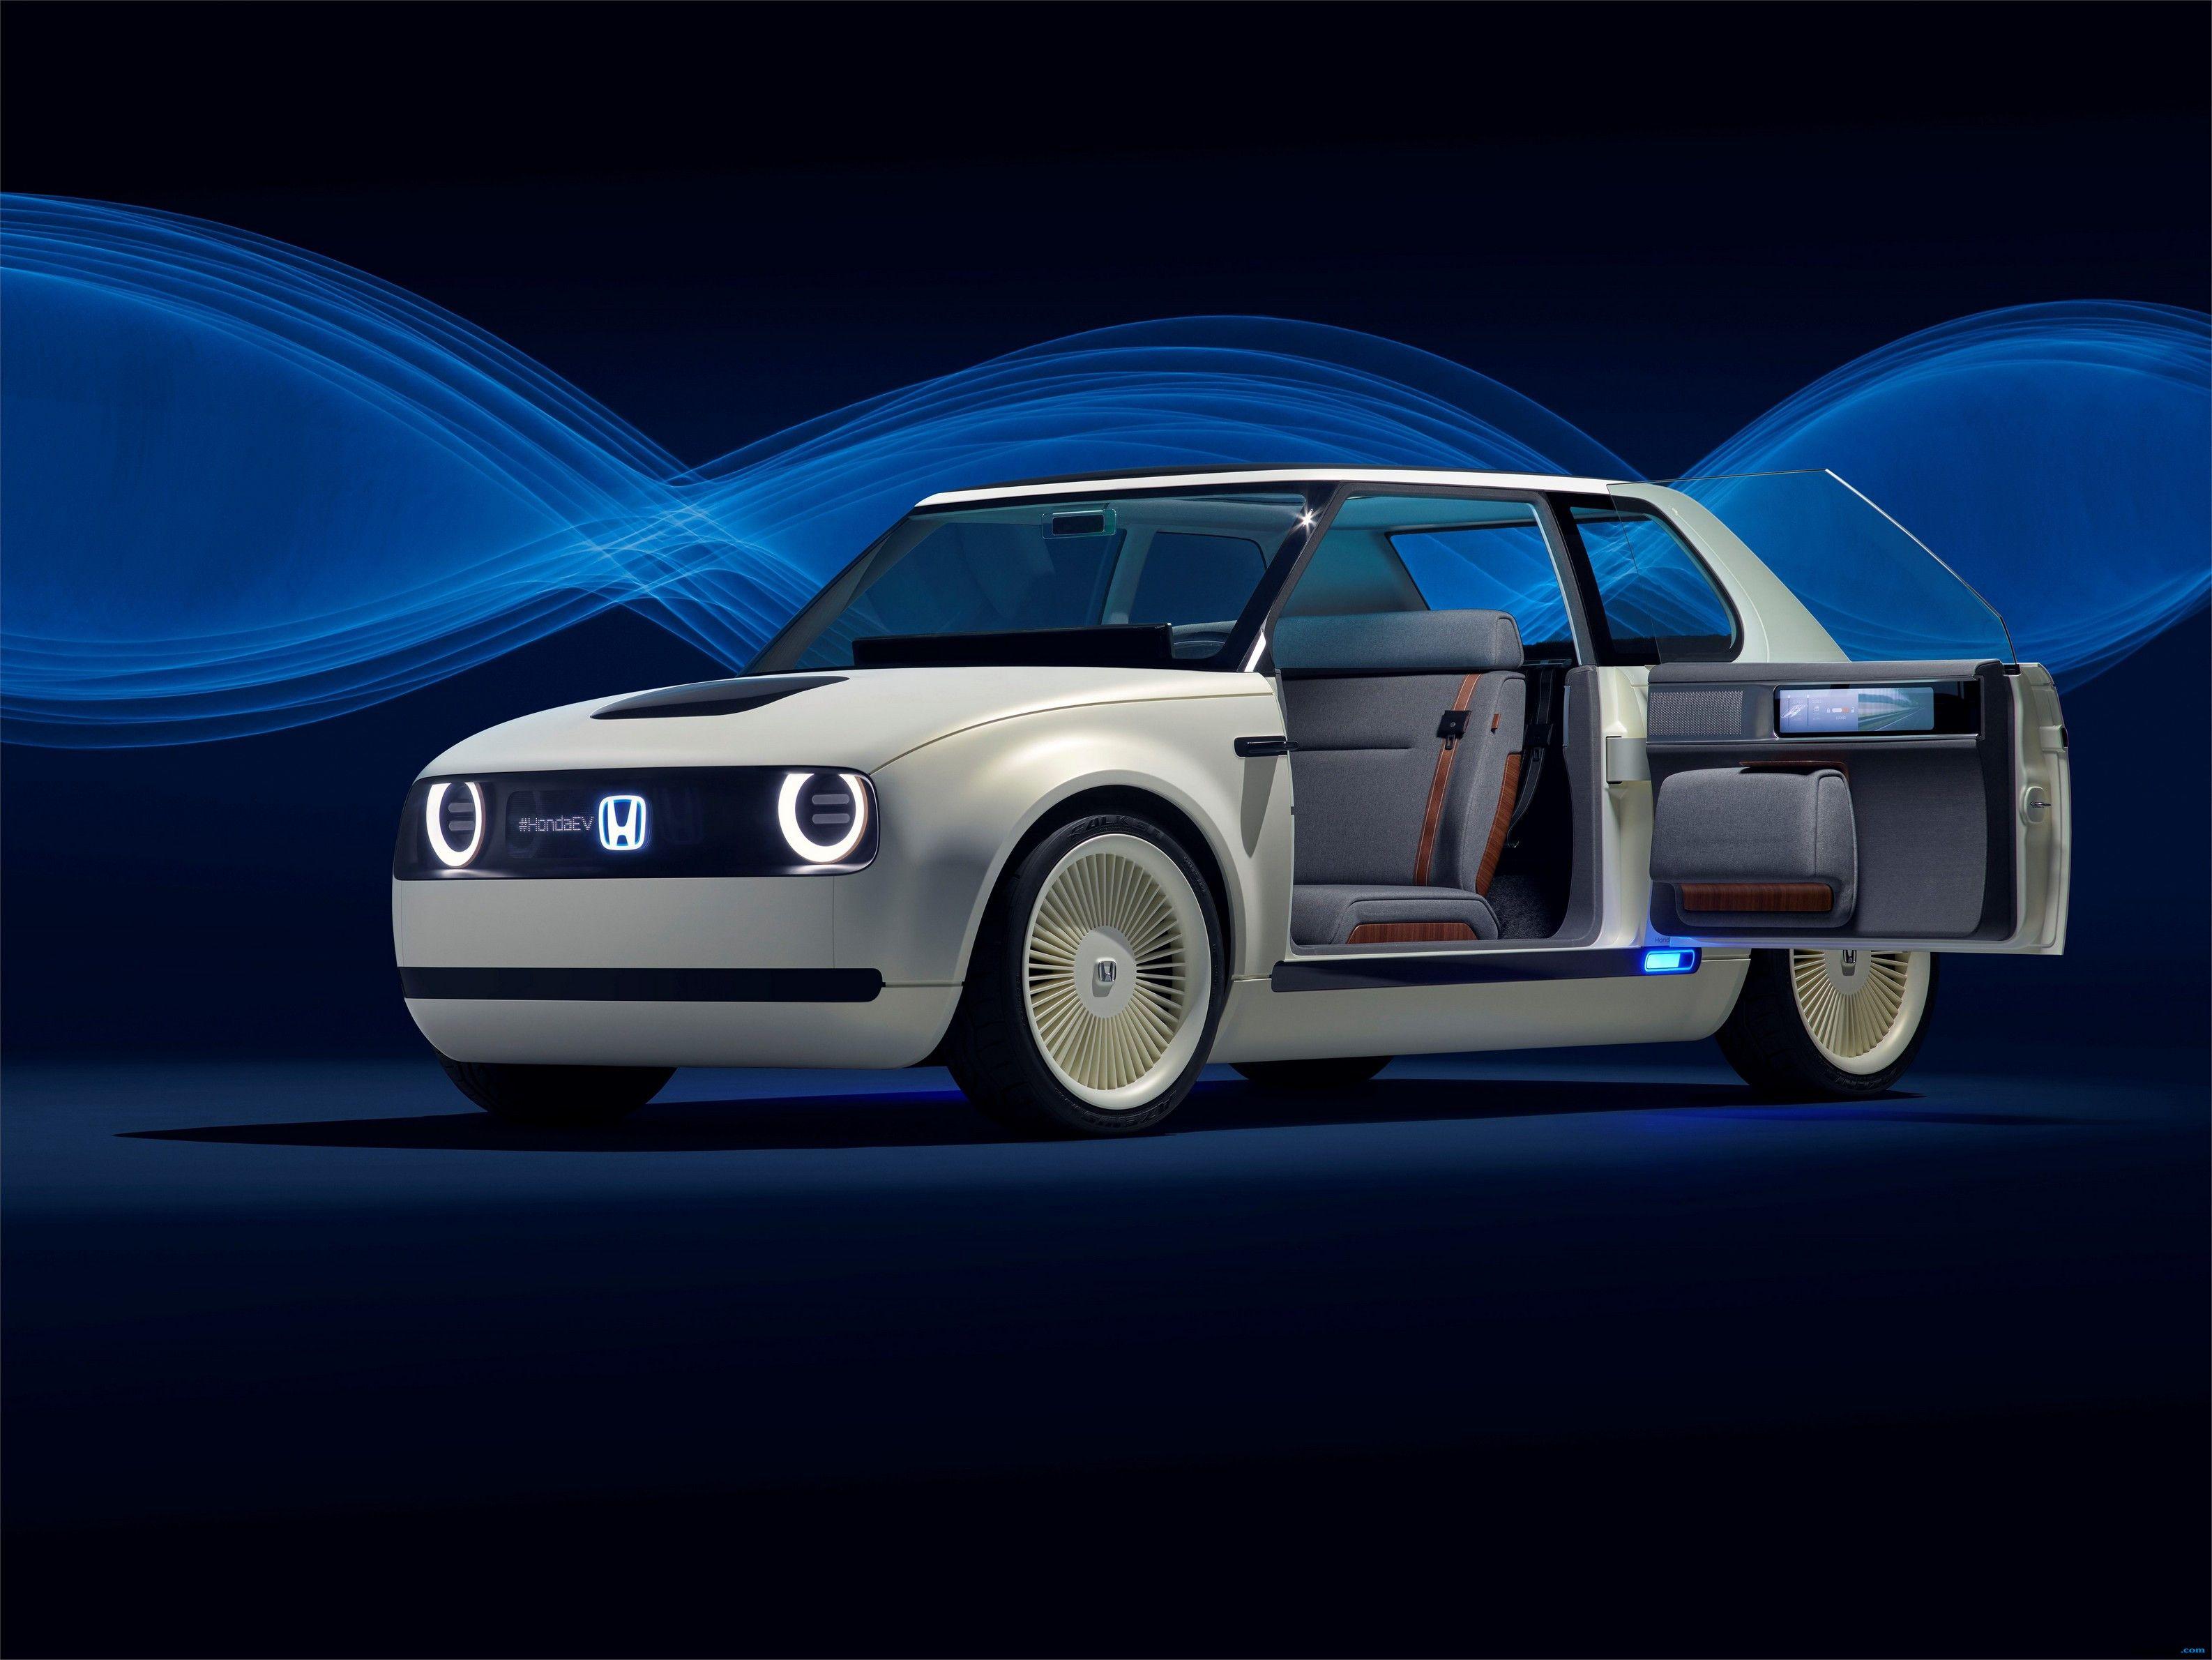 Mobil Konsep Urban EV Besutan Honda Sabet Penghargaan The Best Concept